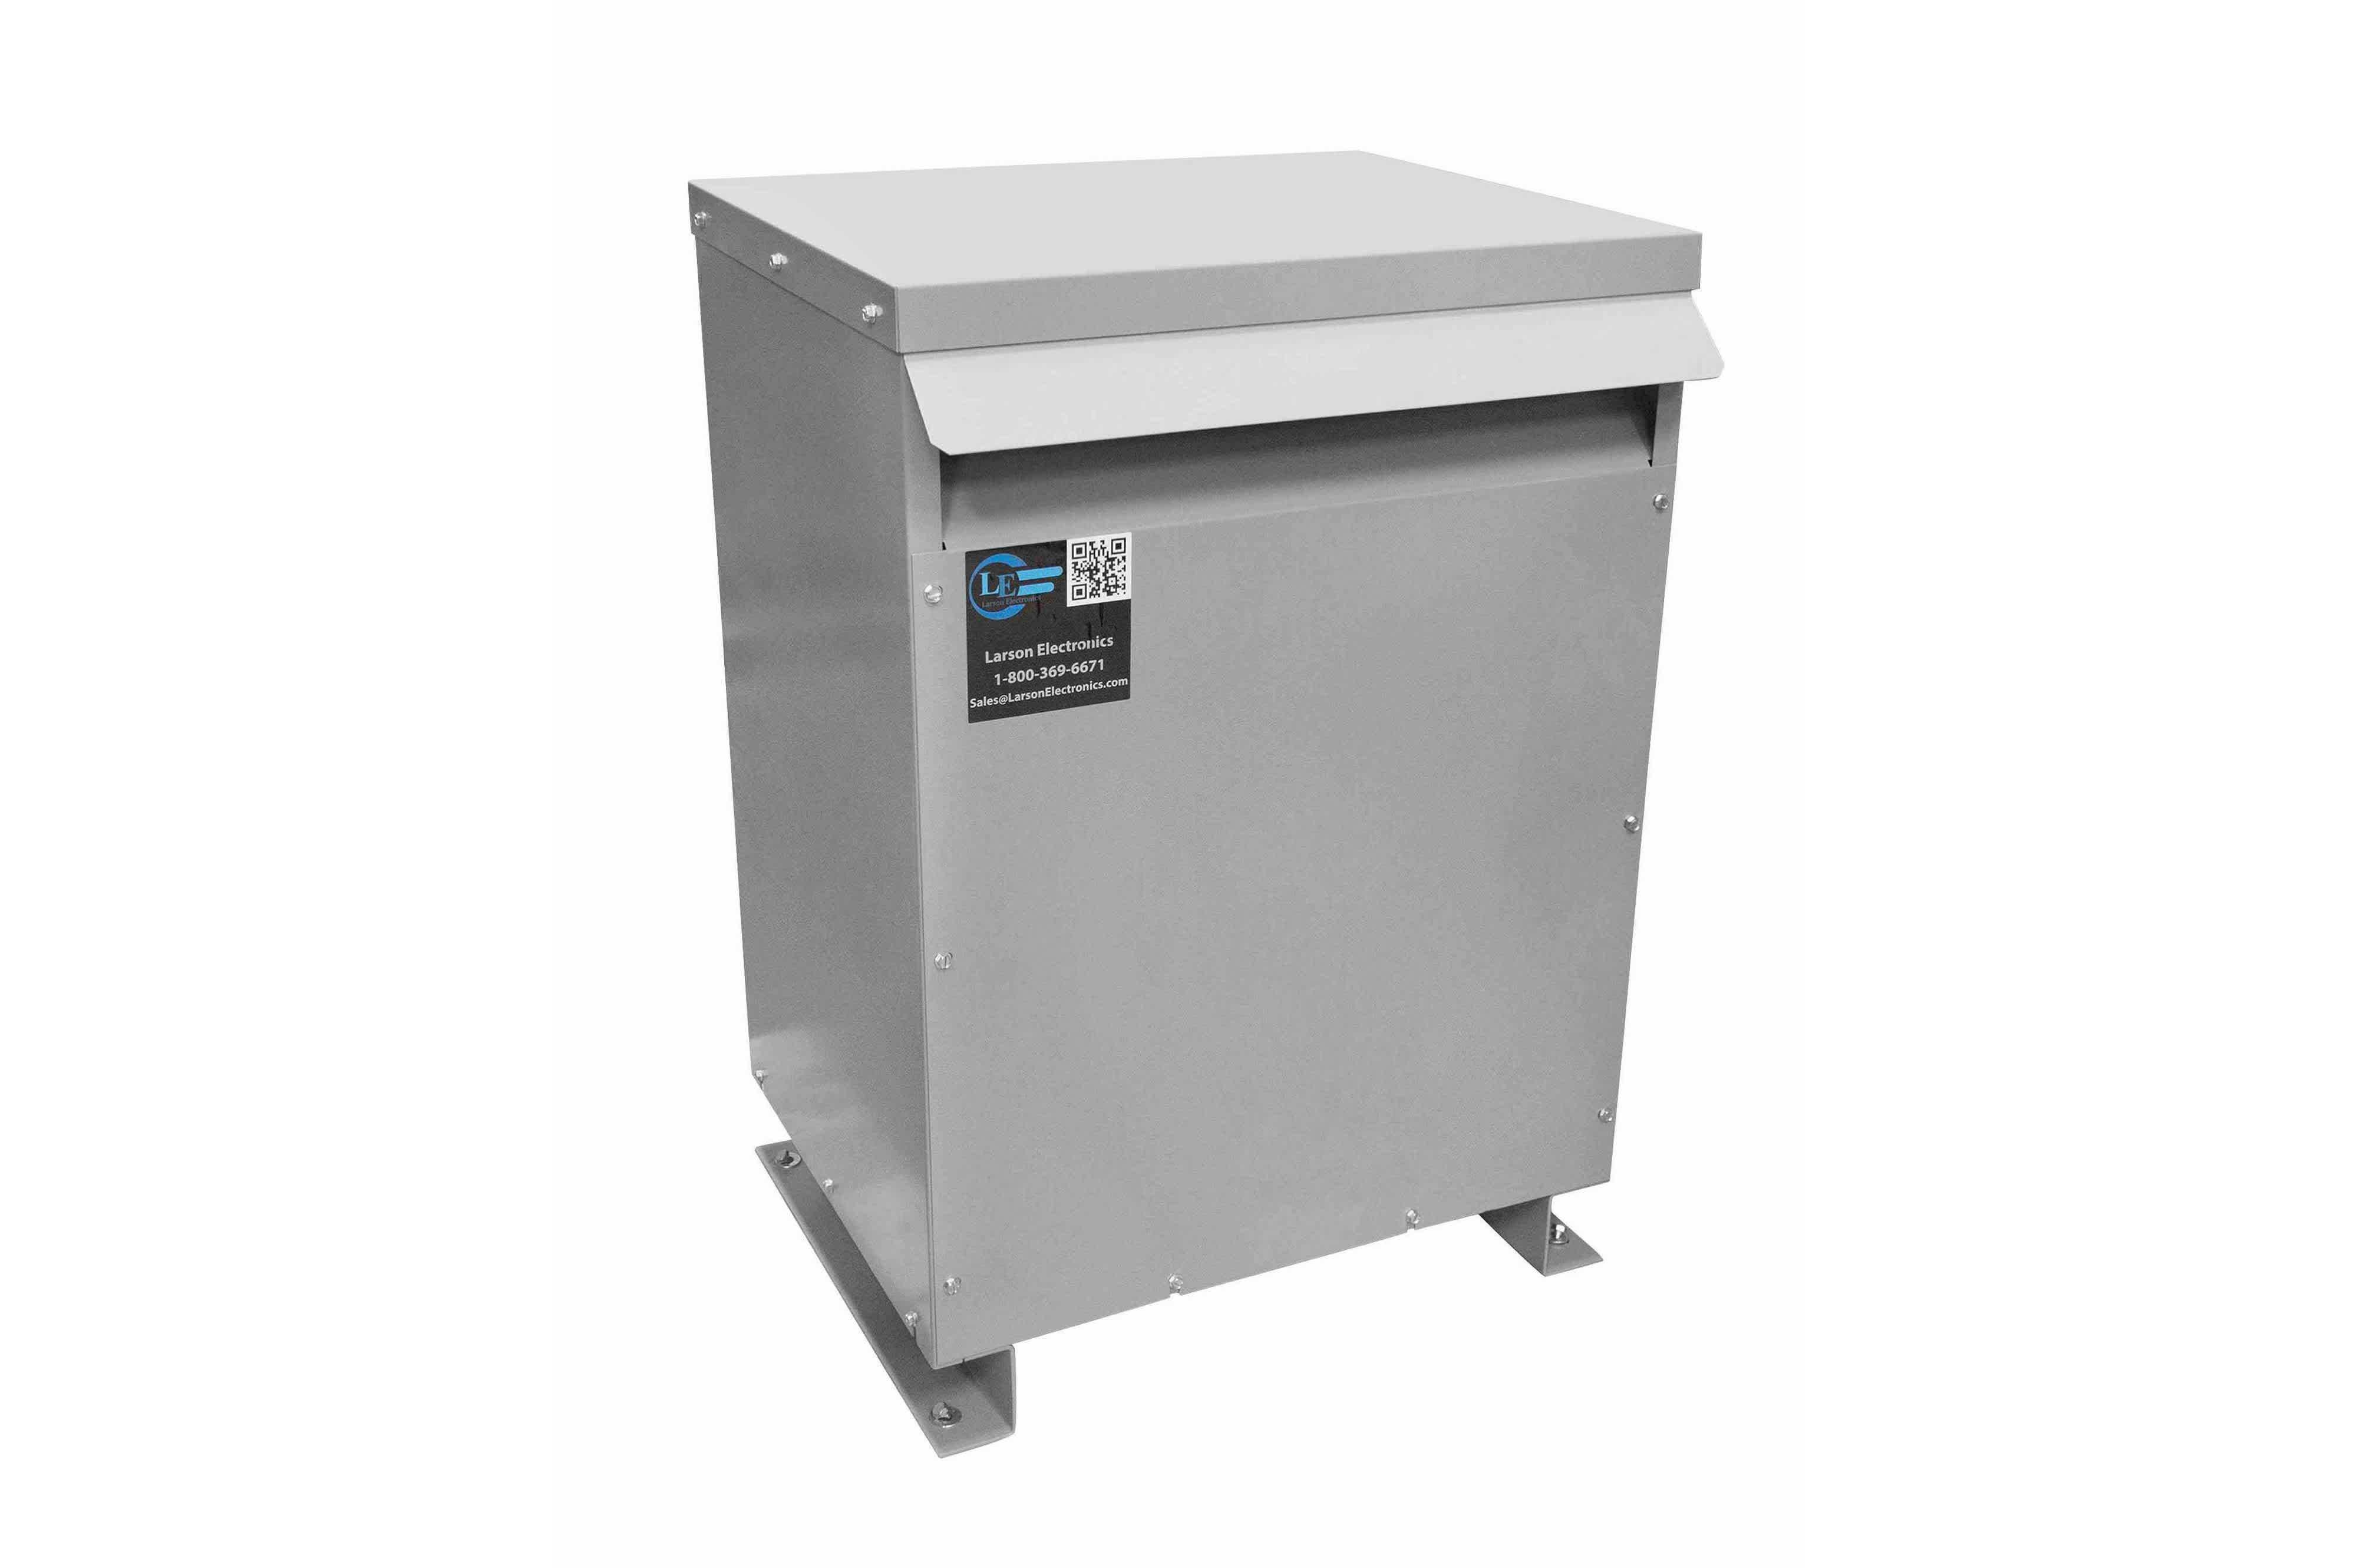 70 kVA 3PH Isolation Transformer, 208V Wye Primary, 240V Delta Secondary, N3R, Ventilated, 60 Hz